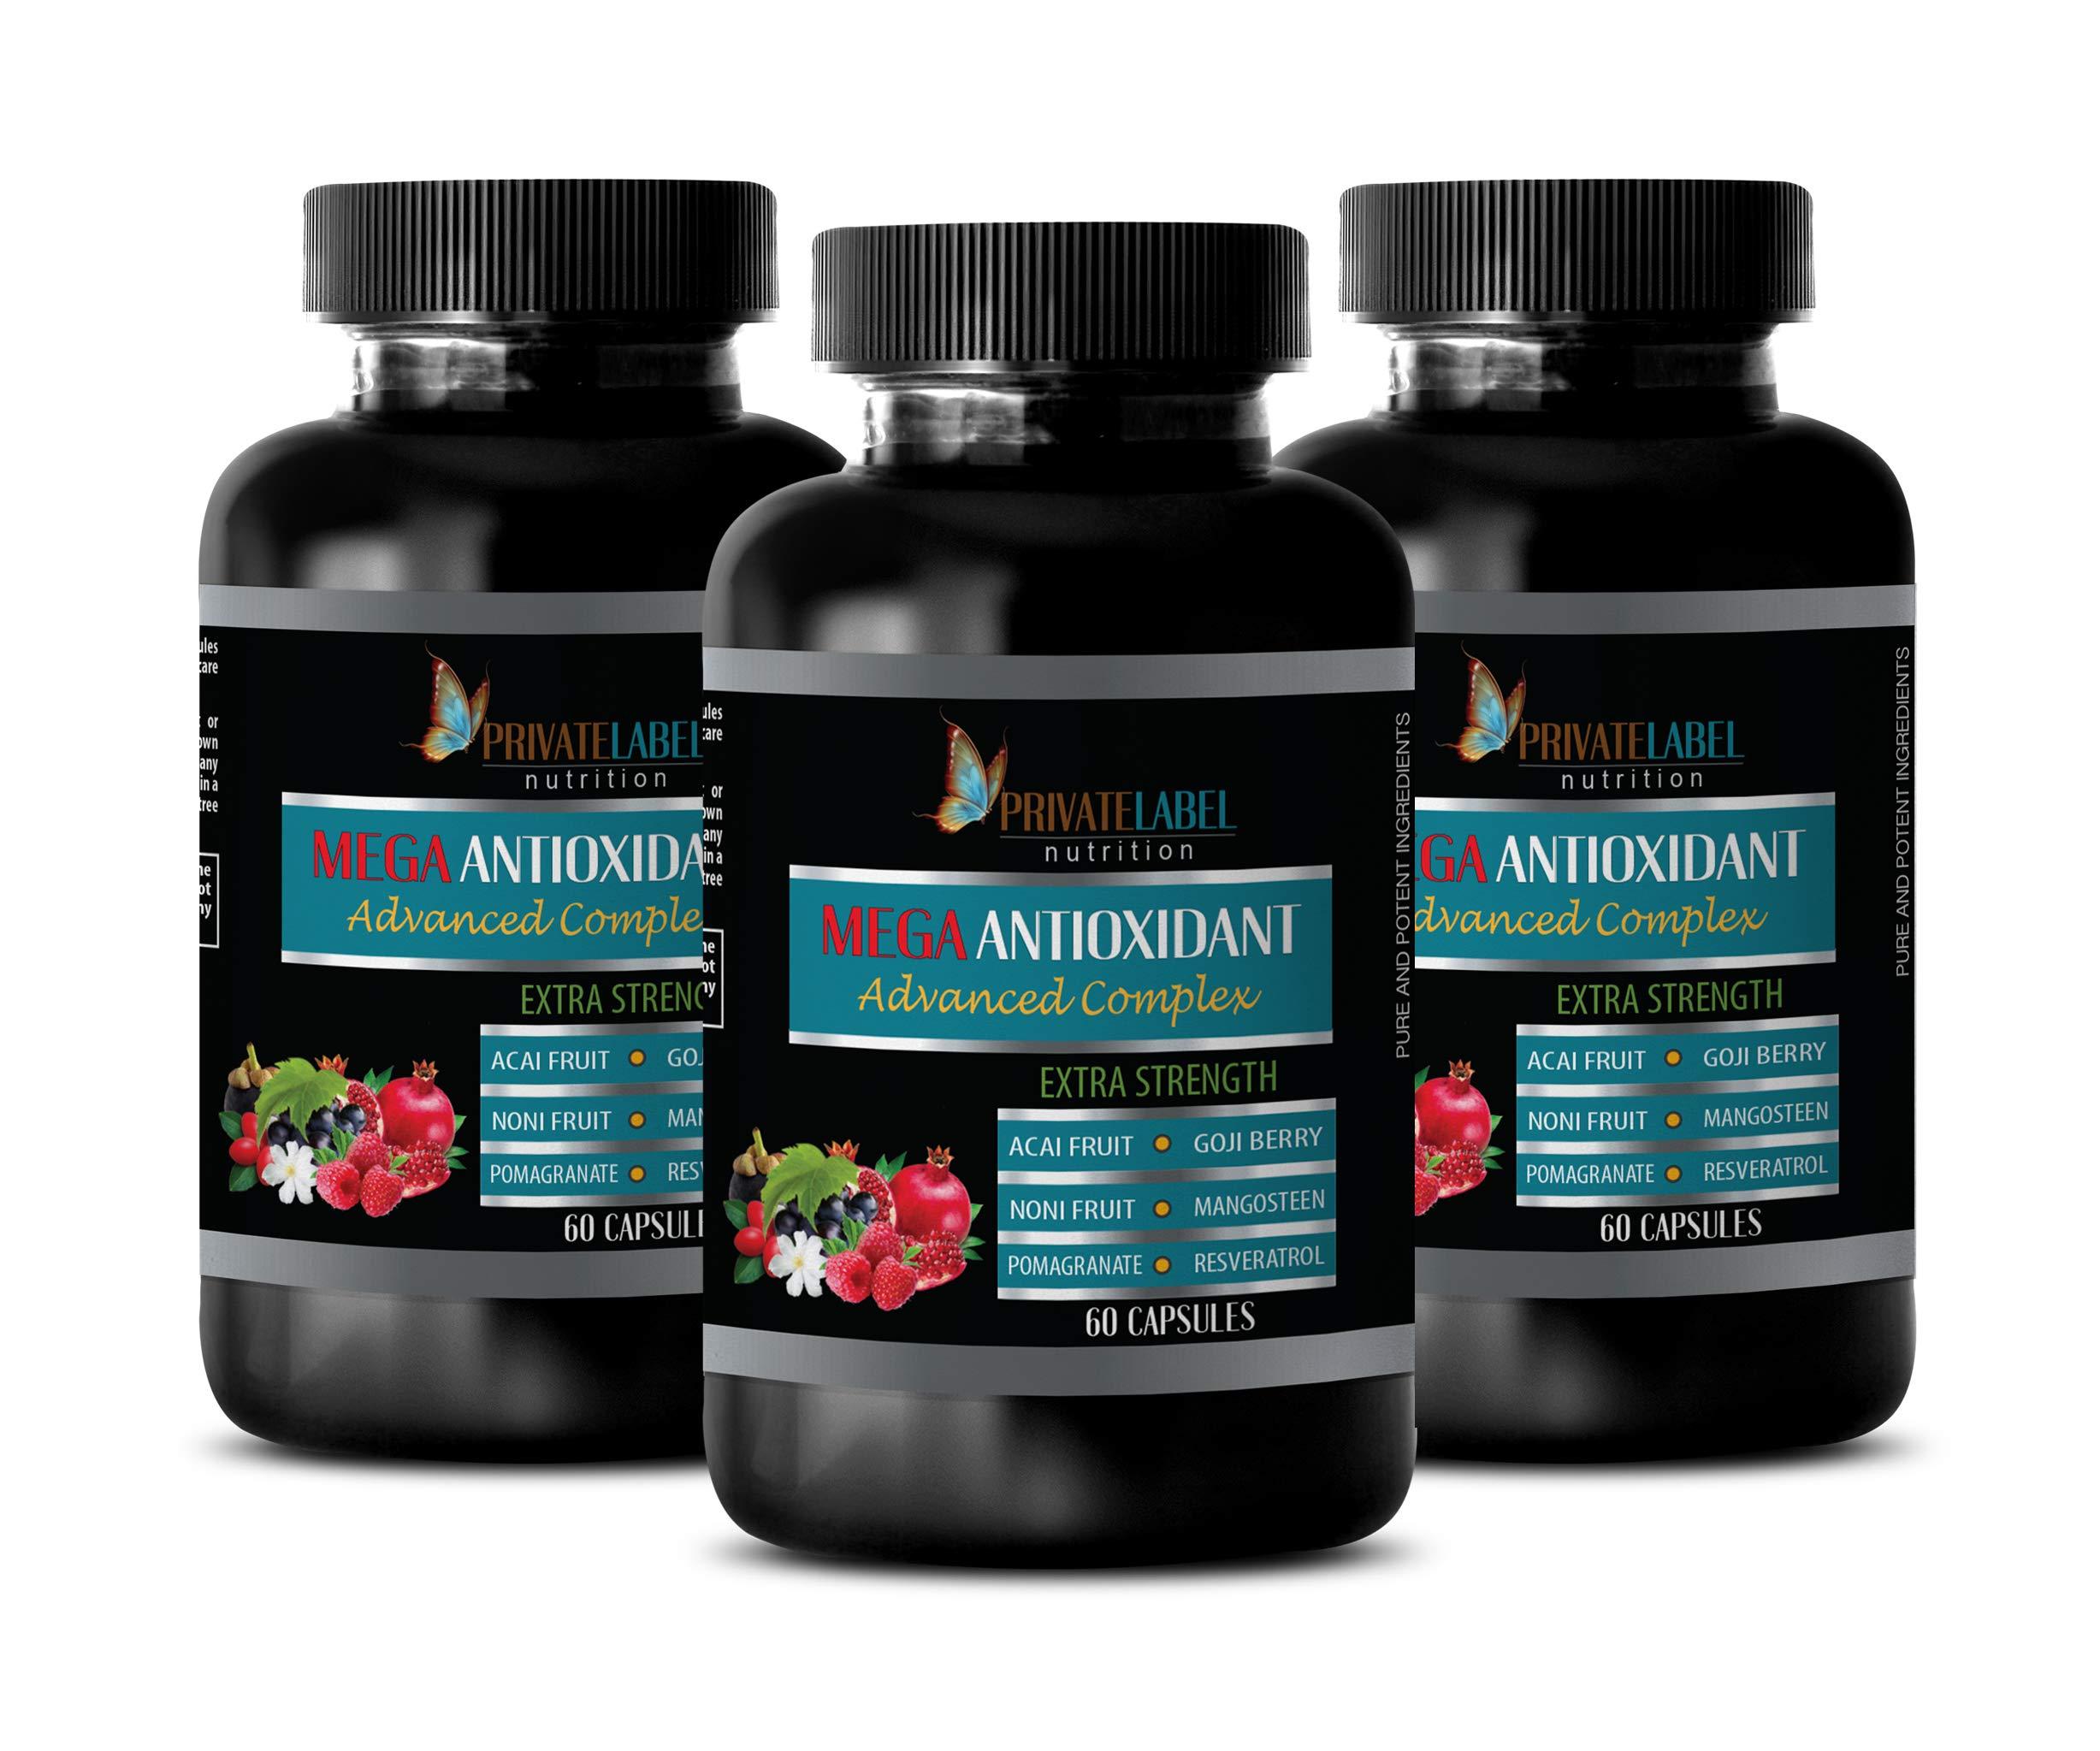 antioxidant Supplement for Men - MEGA ANTIOXIDANT Advanced Complex - Extra Strength - Resveratrol Trans Supplement - 3 Bottles 180 Capsules